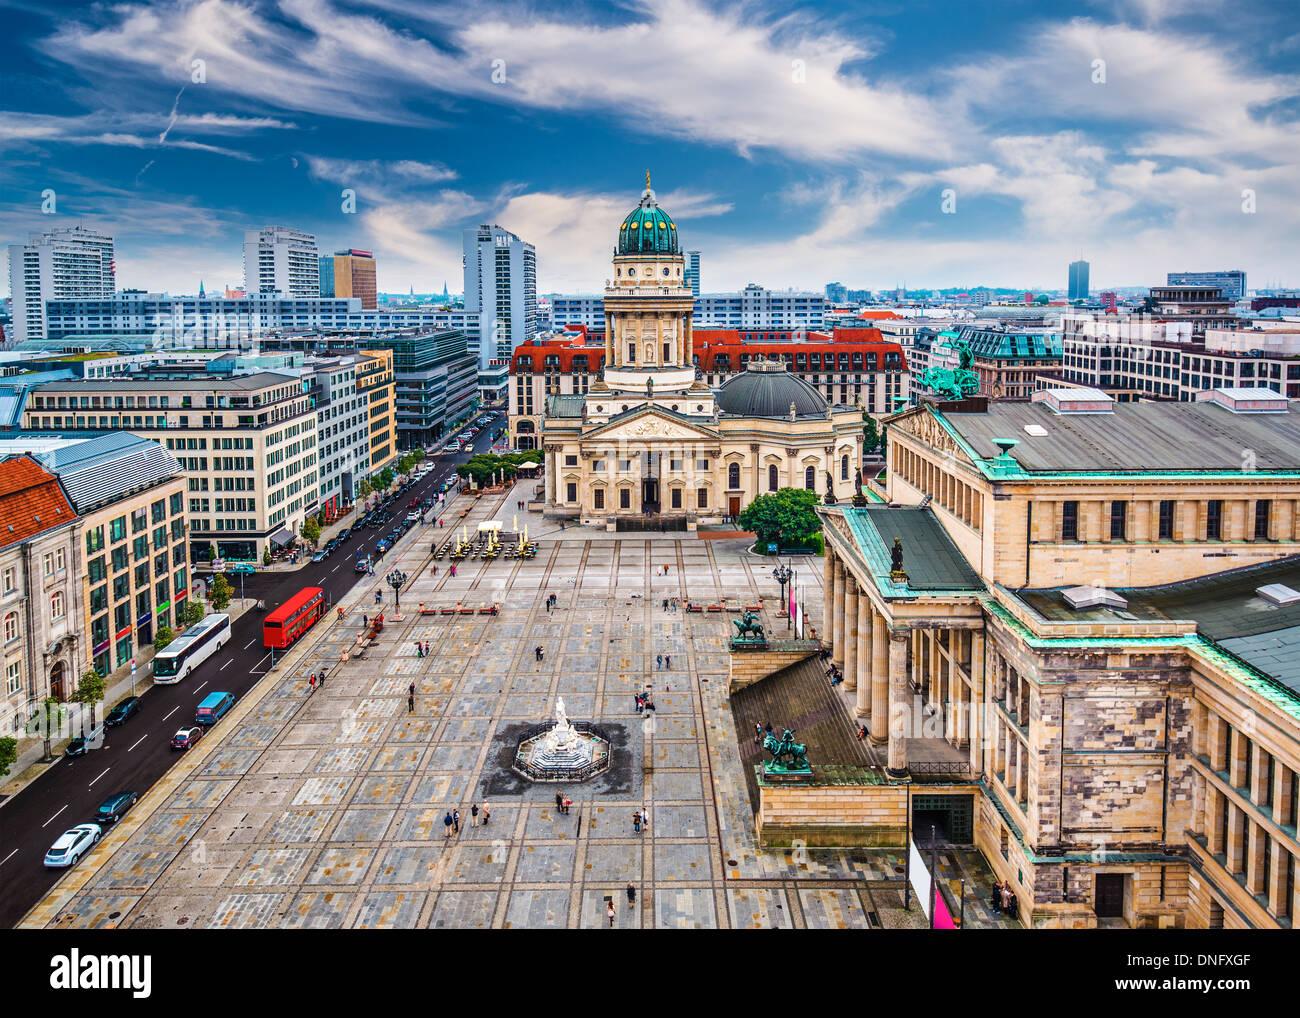 Berlin, Germany skyline over Gendarmenmarkt. - Stock Image